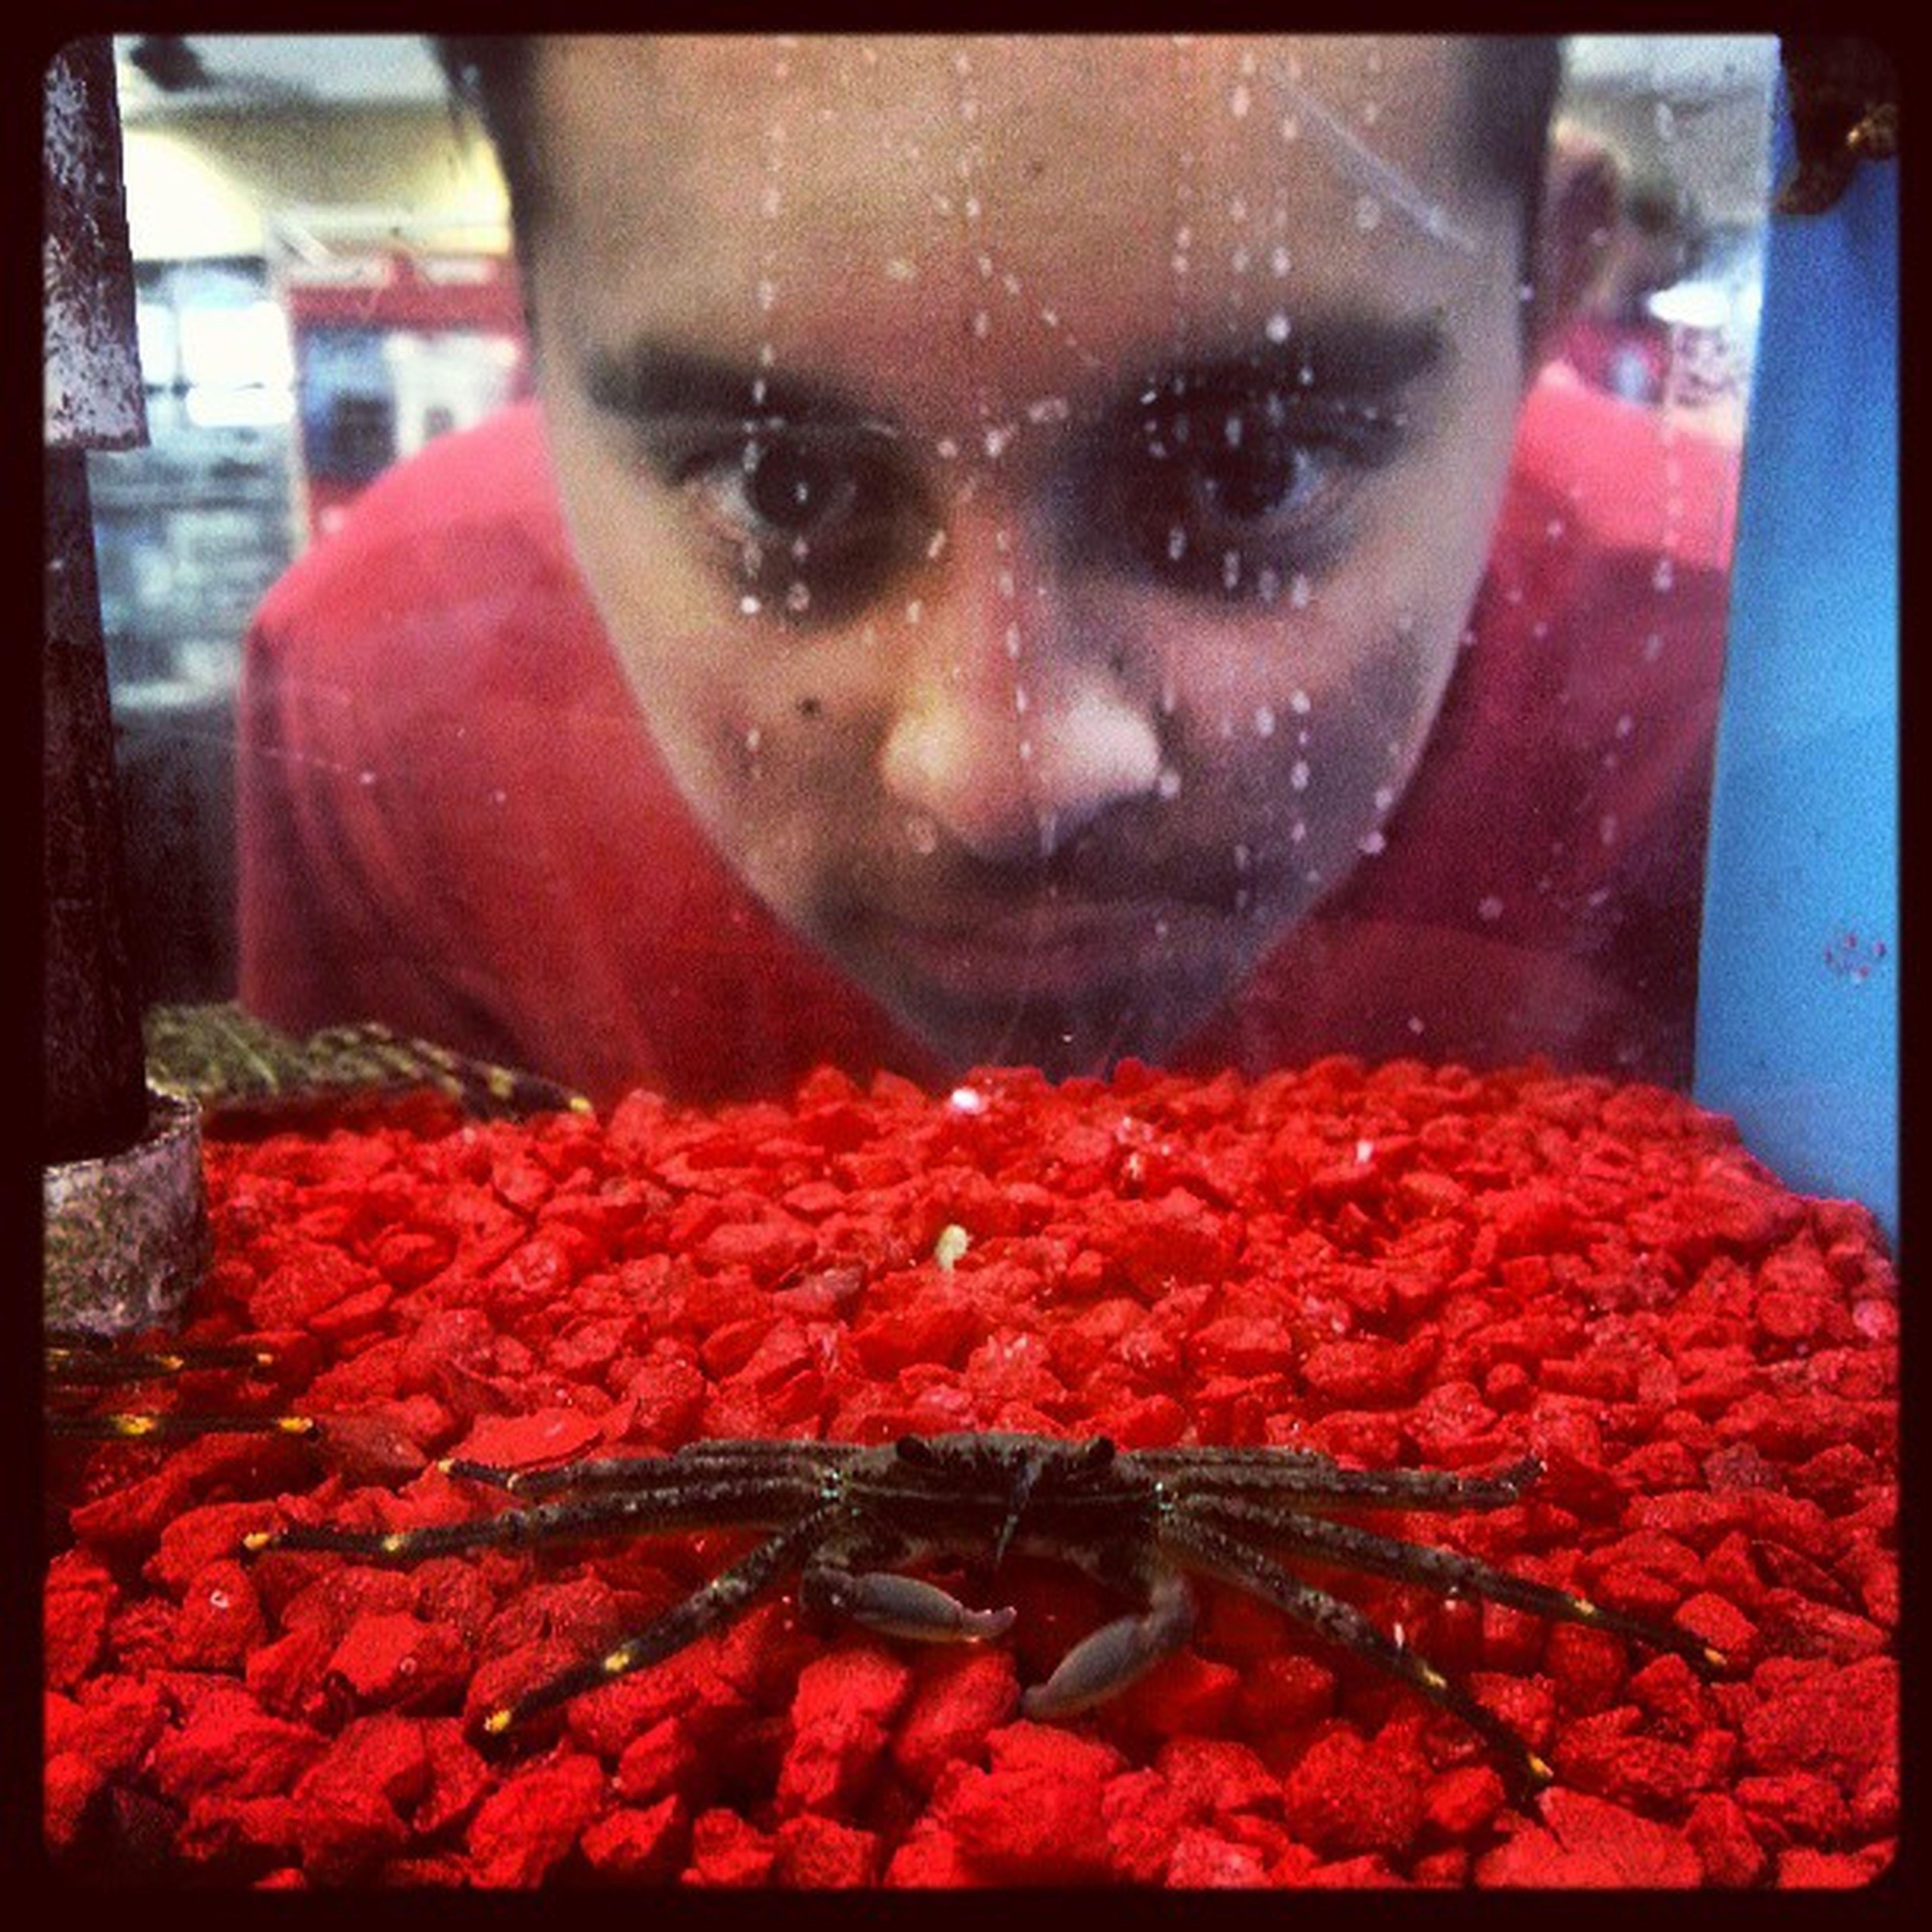 Emilio looking at a Sallylightfoot Crab. Aquarium Fish Crab Oceanlife Austin atx igersaustin igerstexas